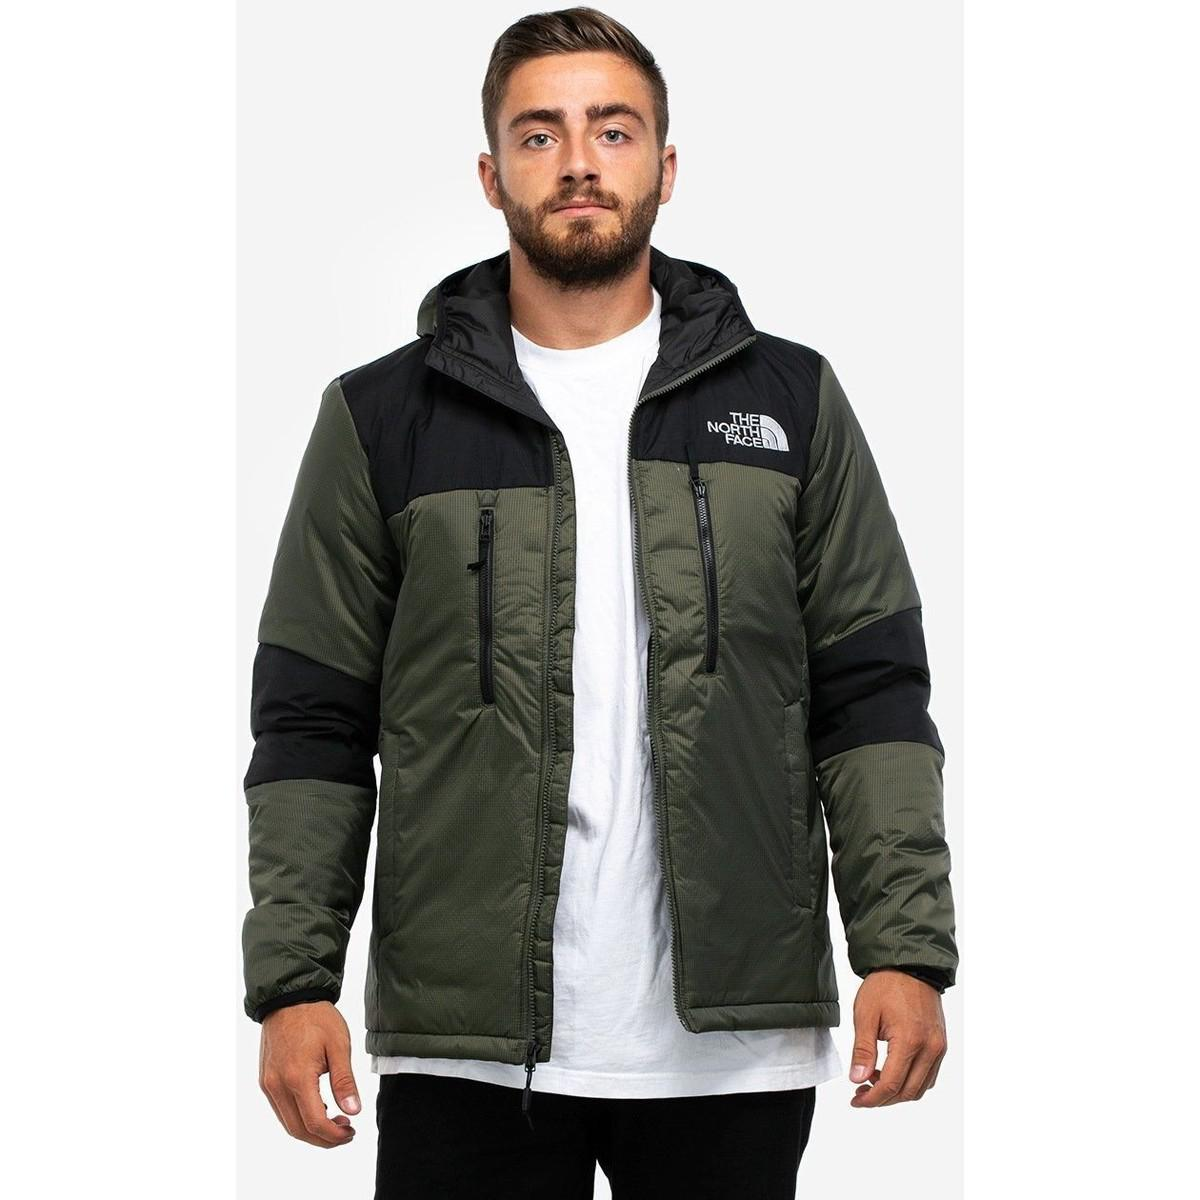 The North Face The Nort Face M Him Ligt Synt Hood New Taupe Greentnf Black L2g Men's Jacket In Green for men